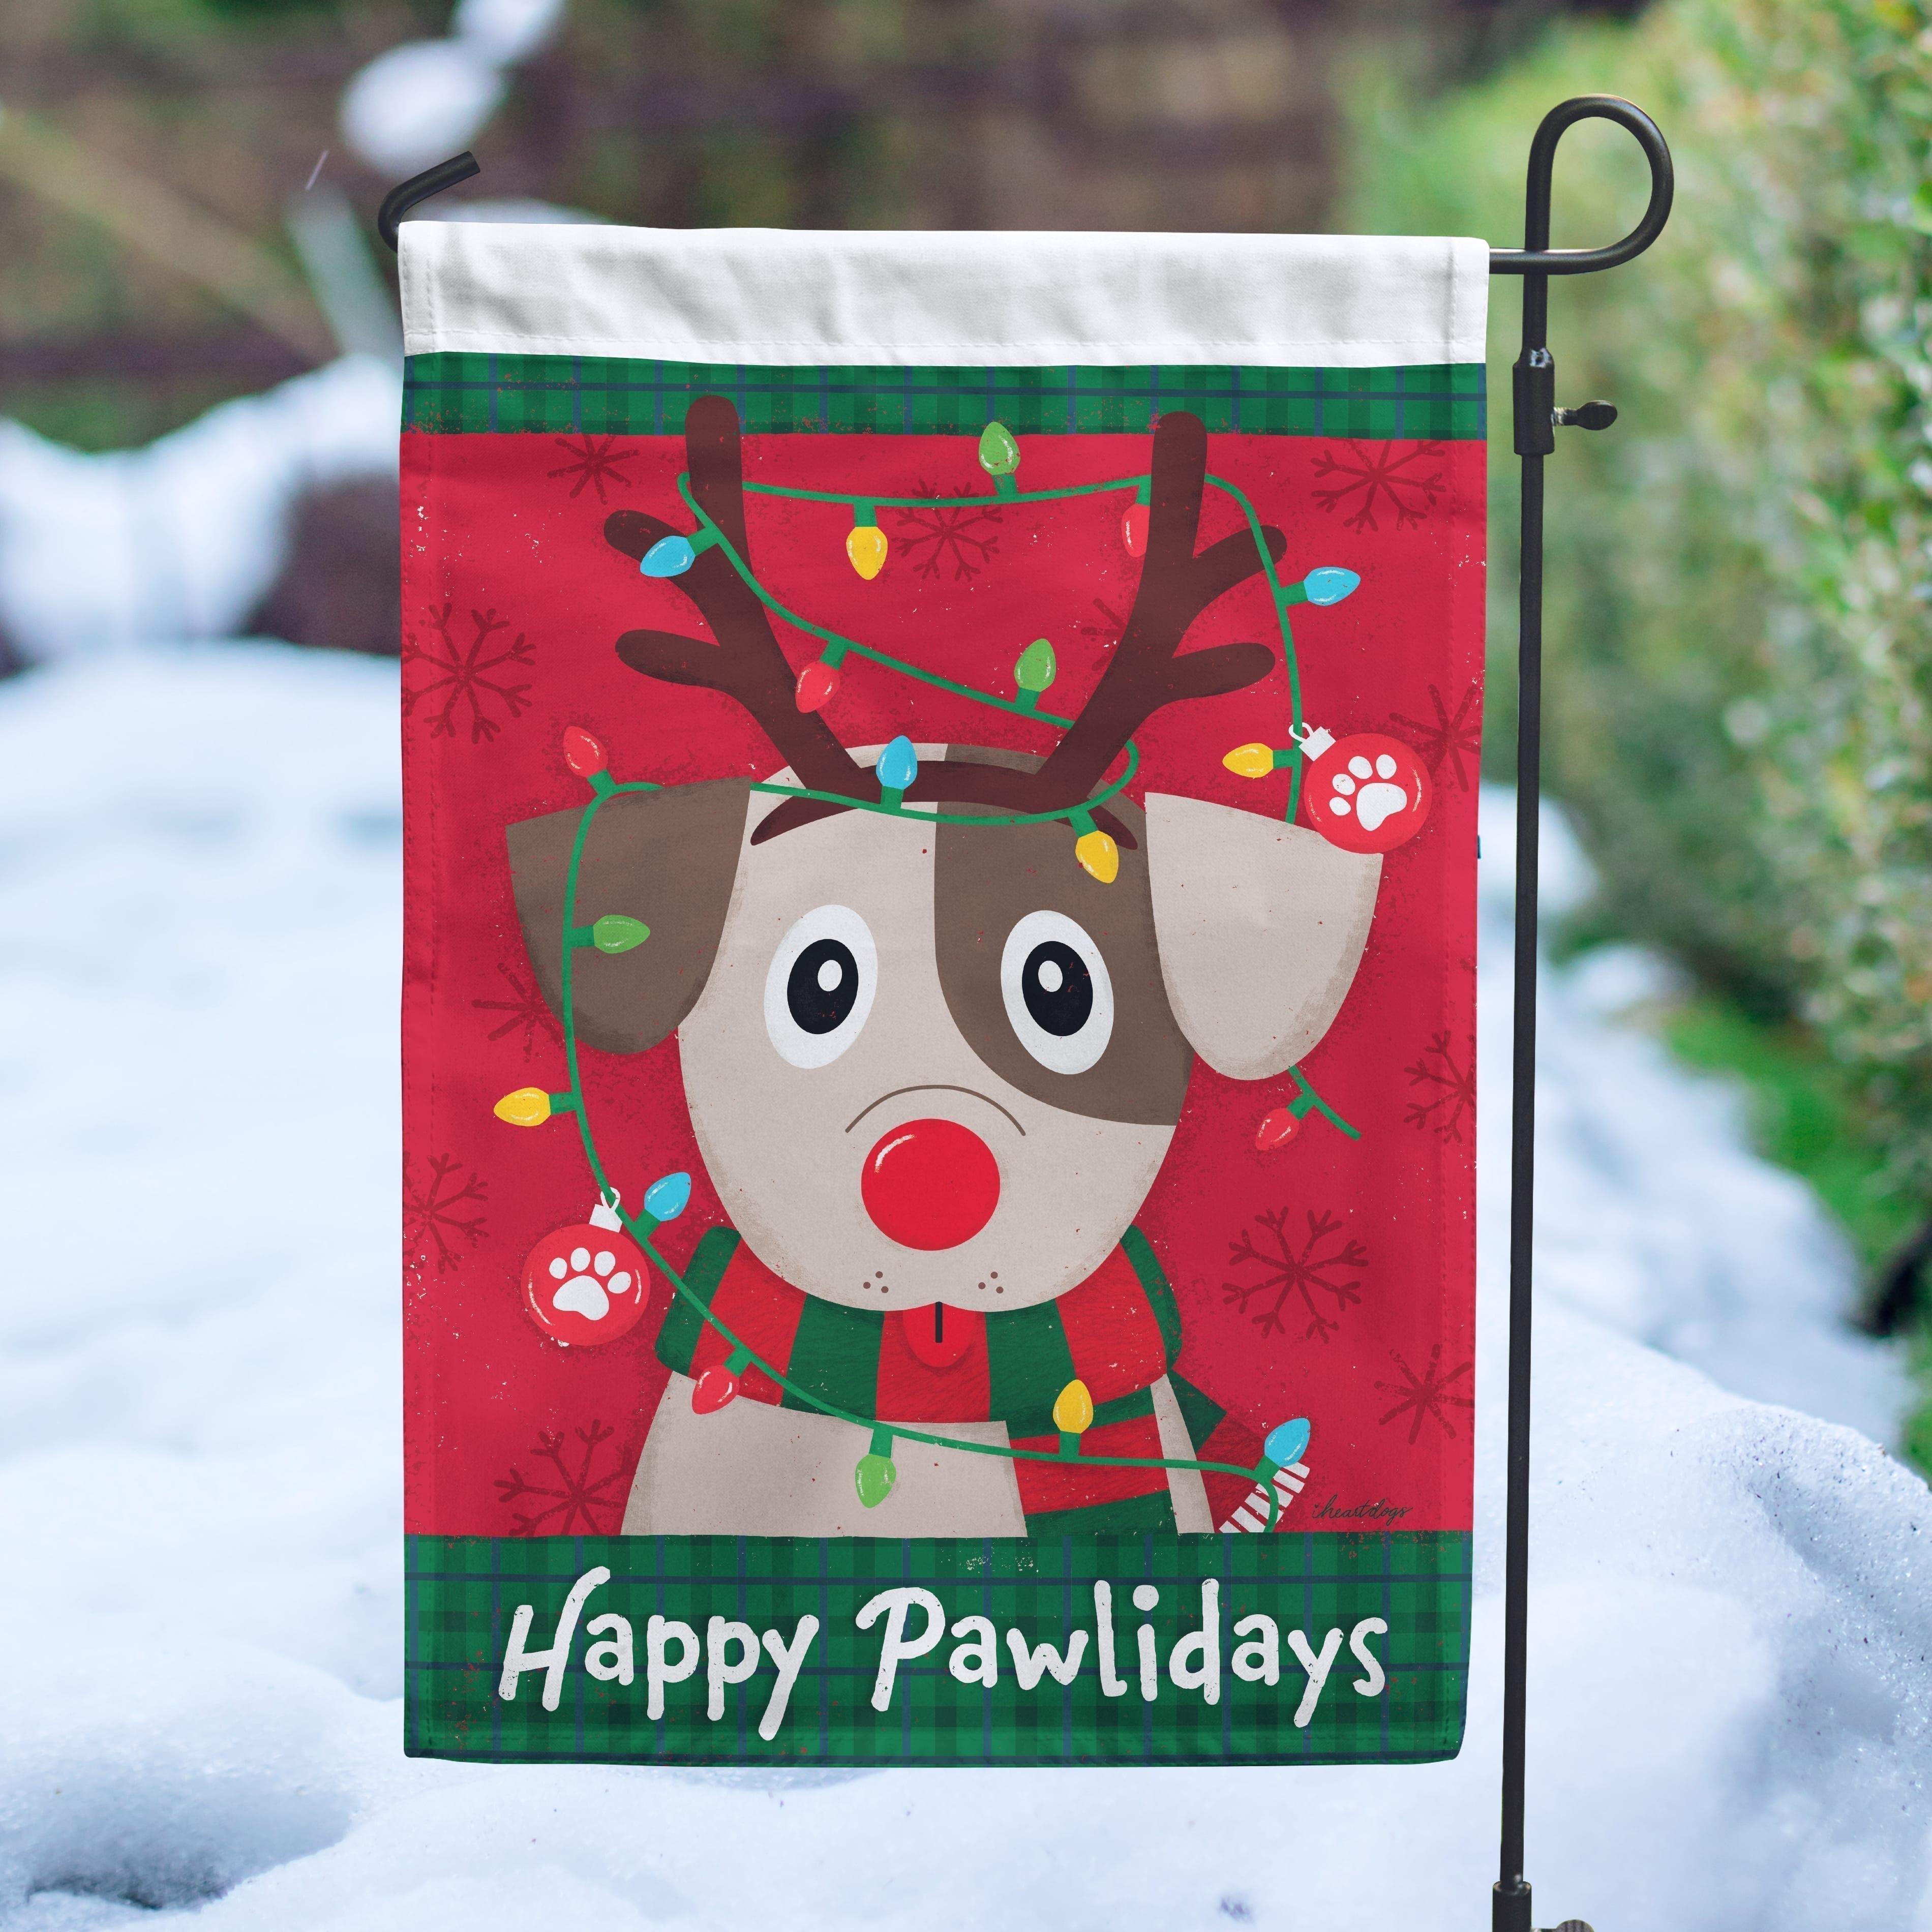 Happy Pawlidays Reindeer Pup Garden Flag - Get 2 for $14.99!